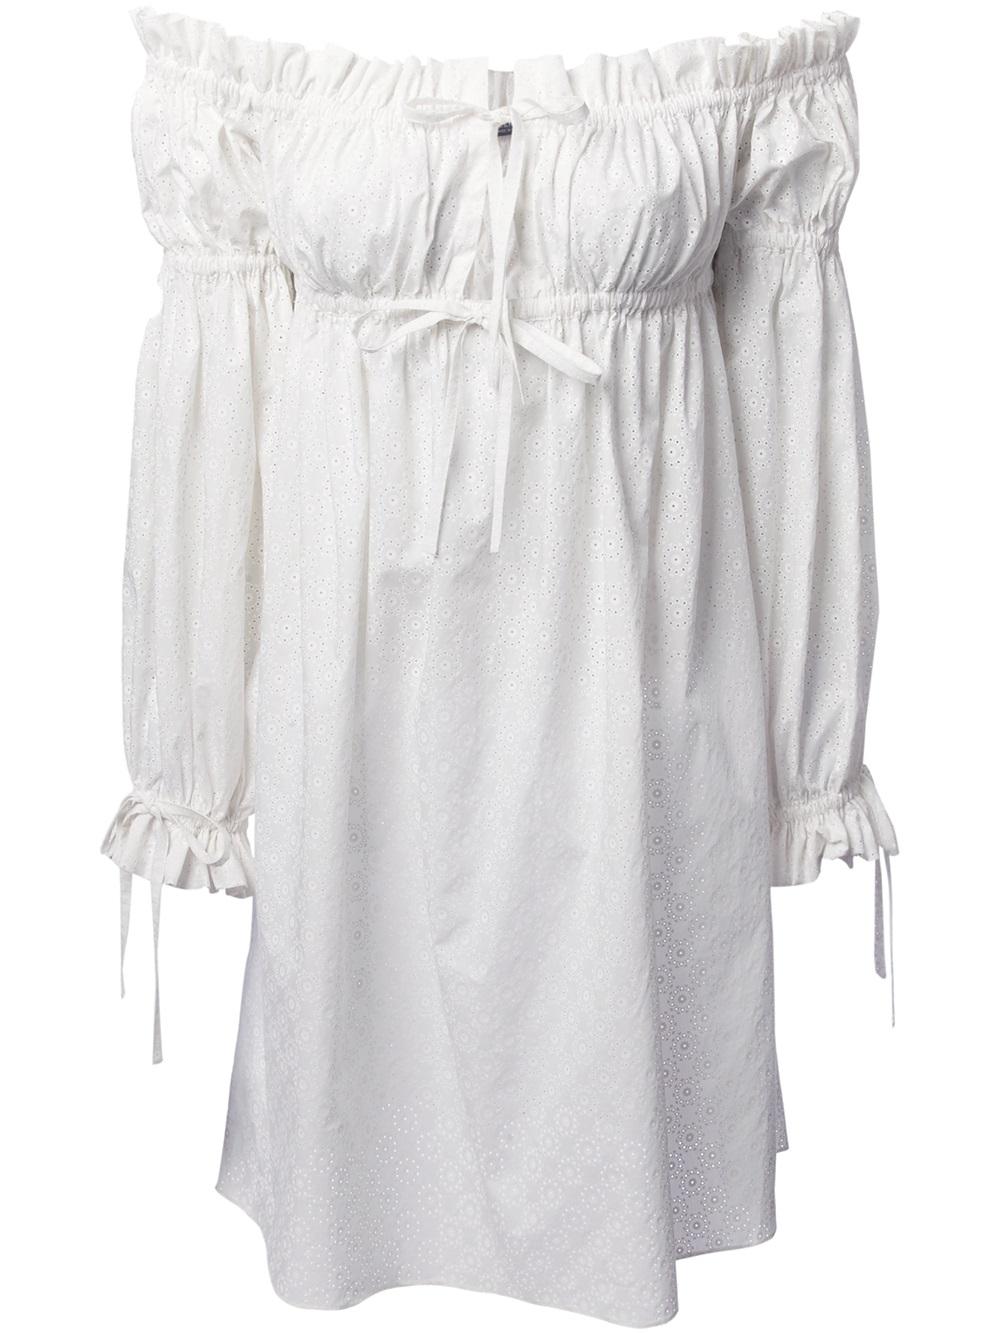 Alexander mcqueen Gypsy Dress in White - Lyst